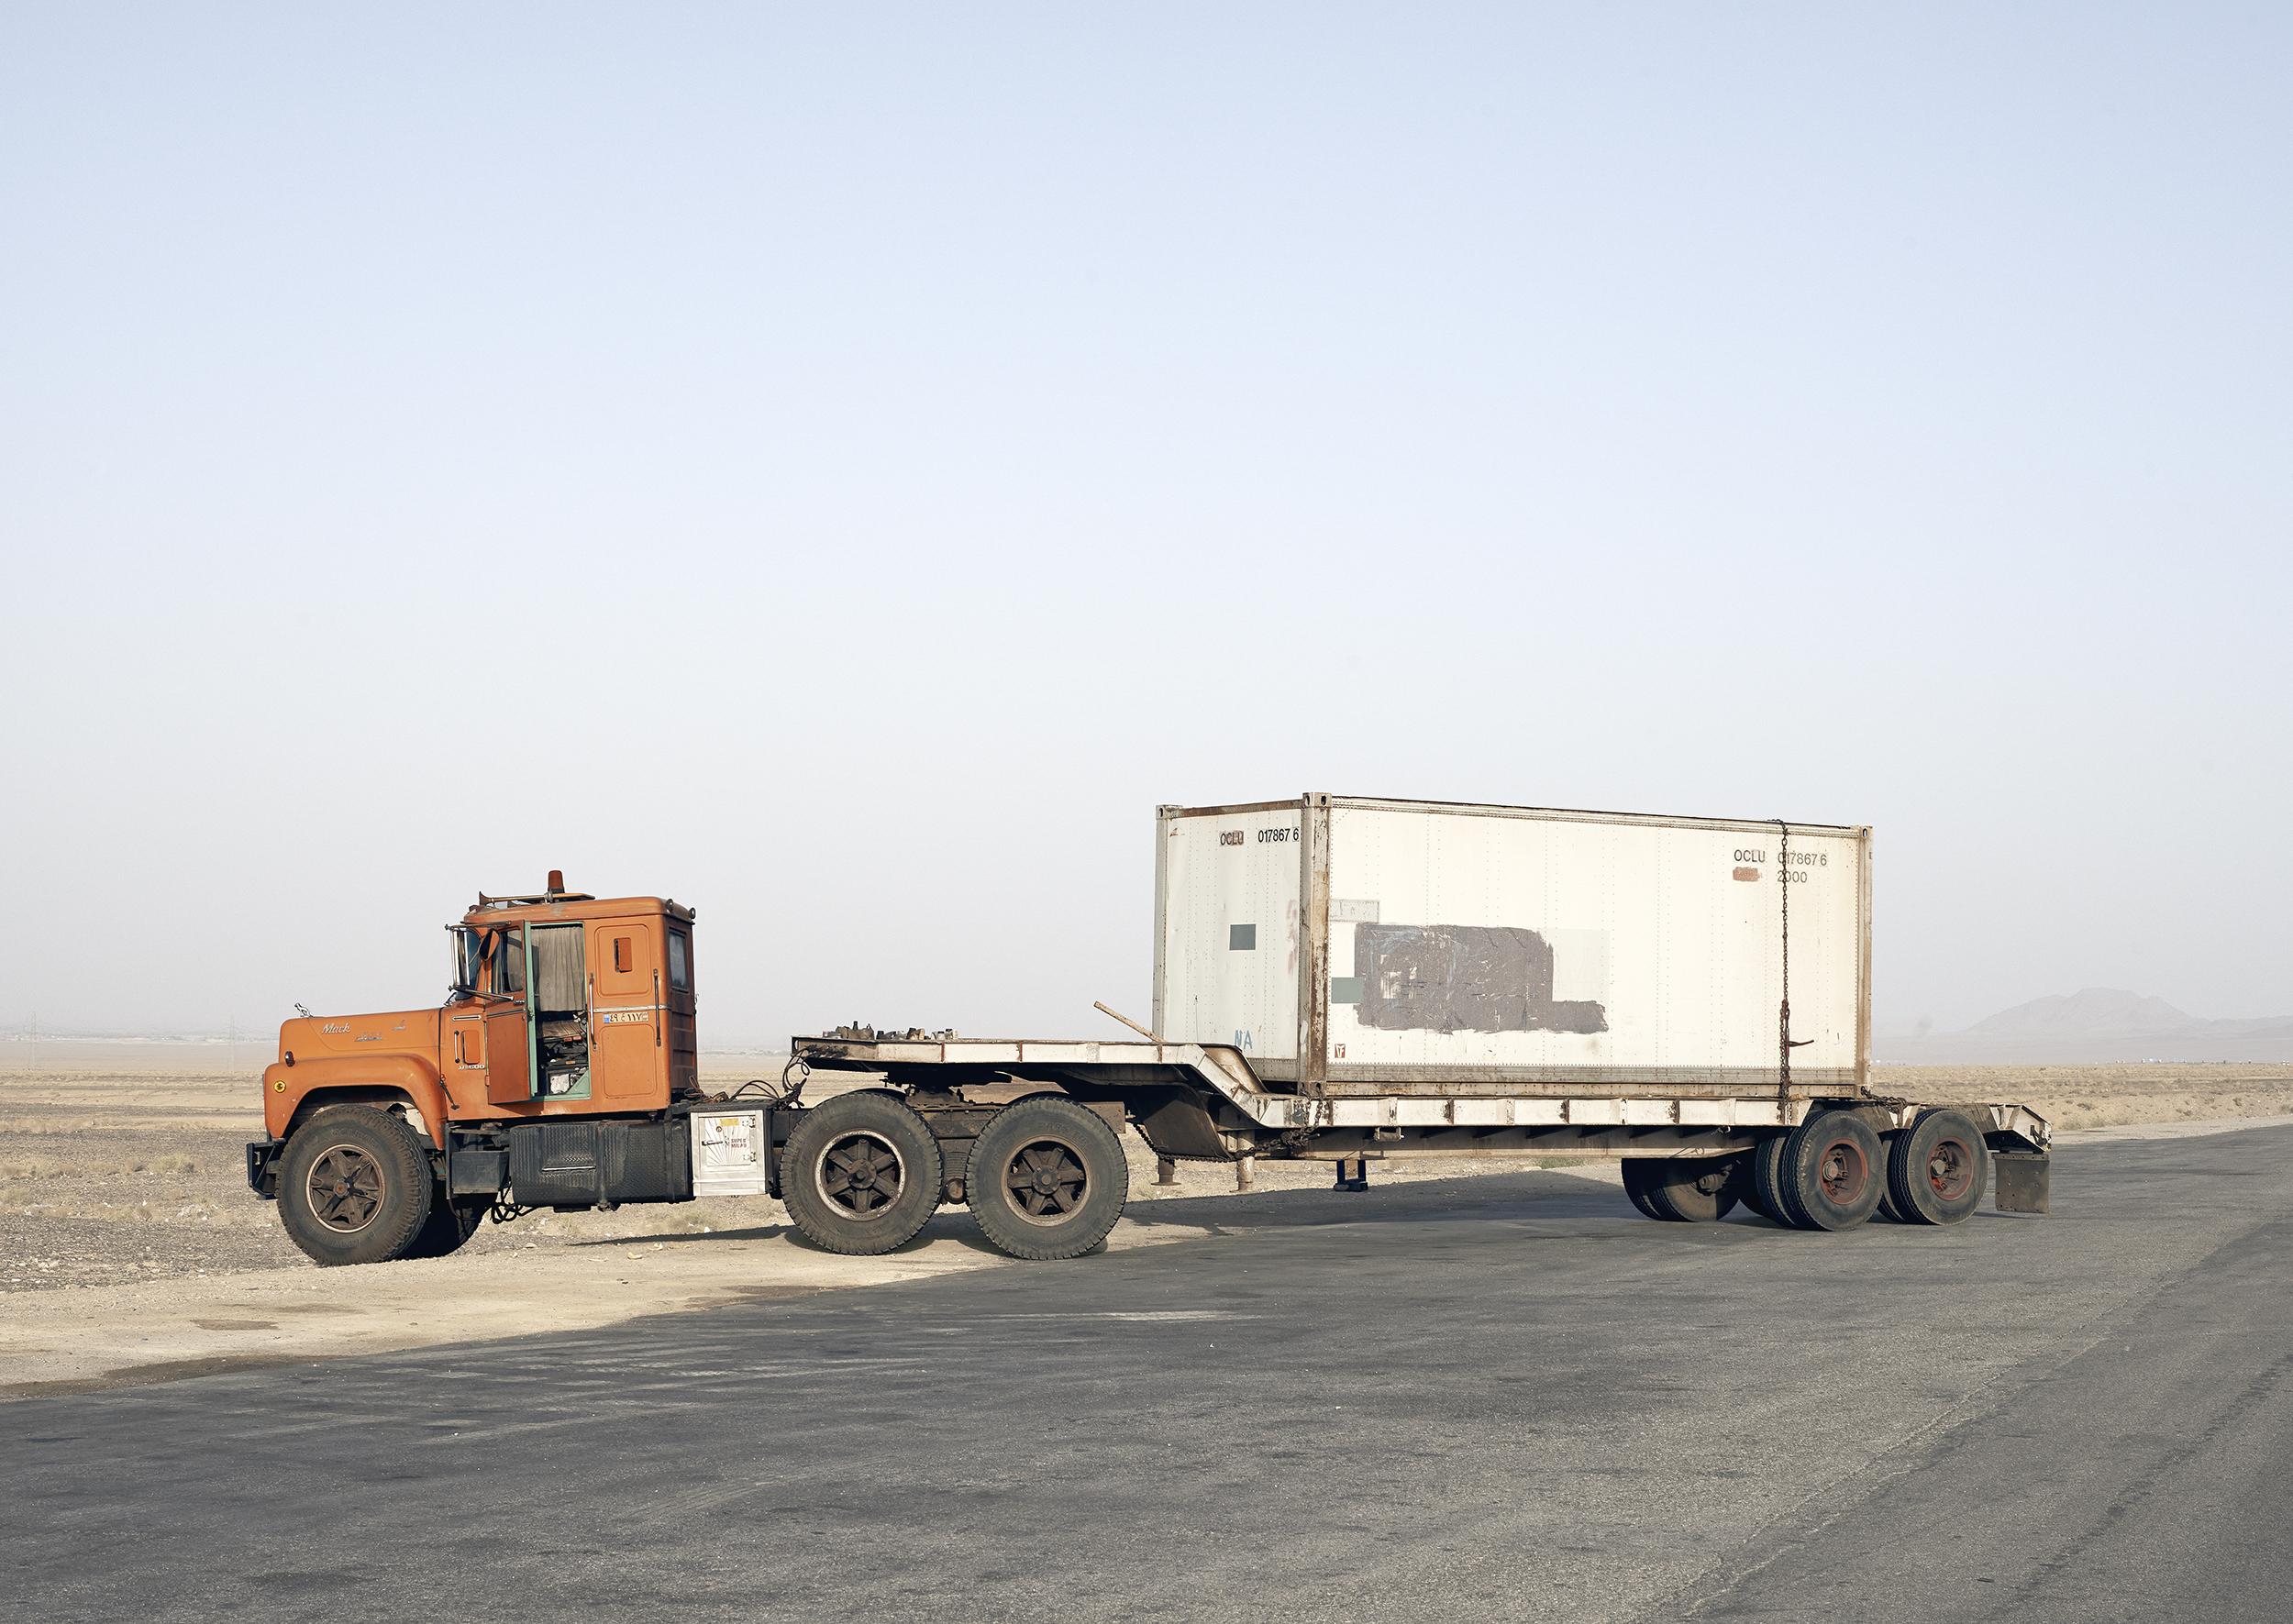 ZO_Mack Truck, Kashan, Iran, 2015.jpg